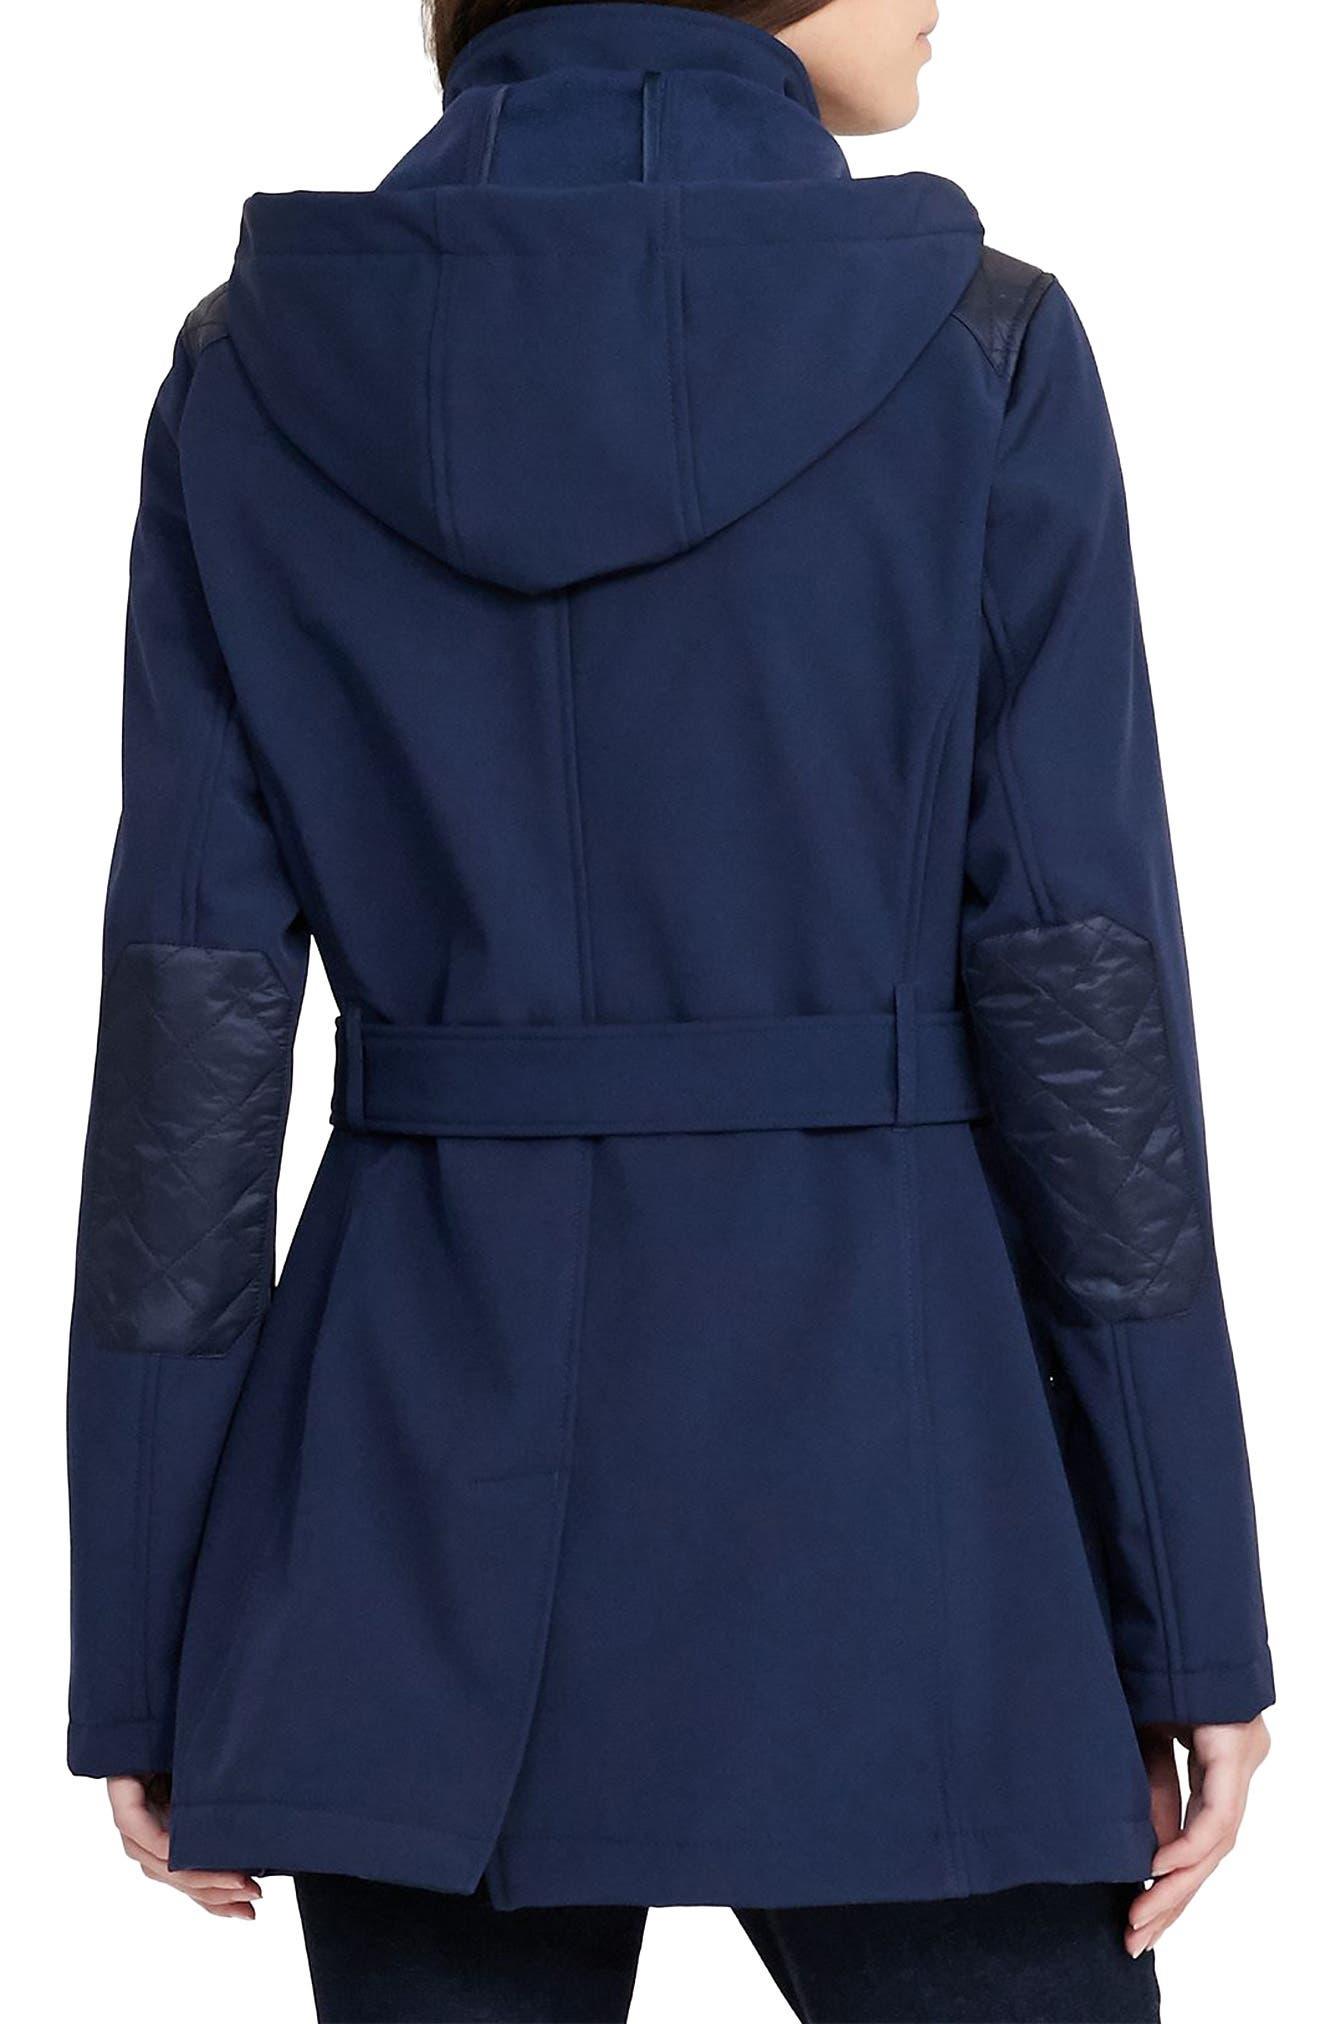 Alternate Image 2  - Lauren Ralph Lauren Belted Hooded Soft Shell Jacket